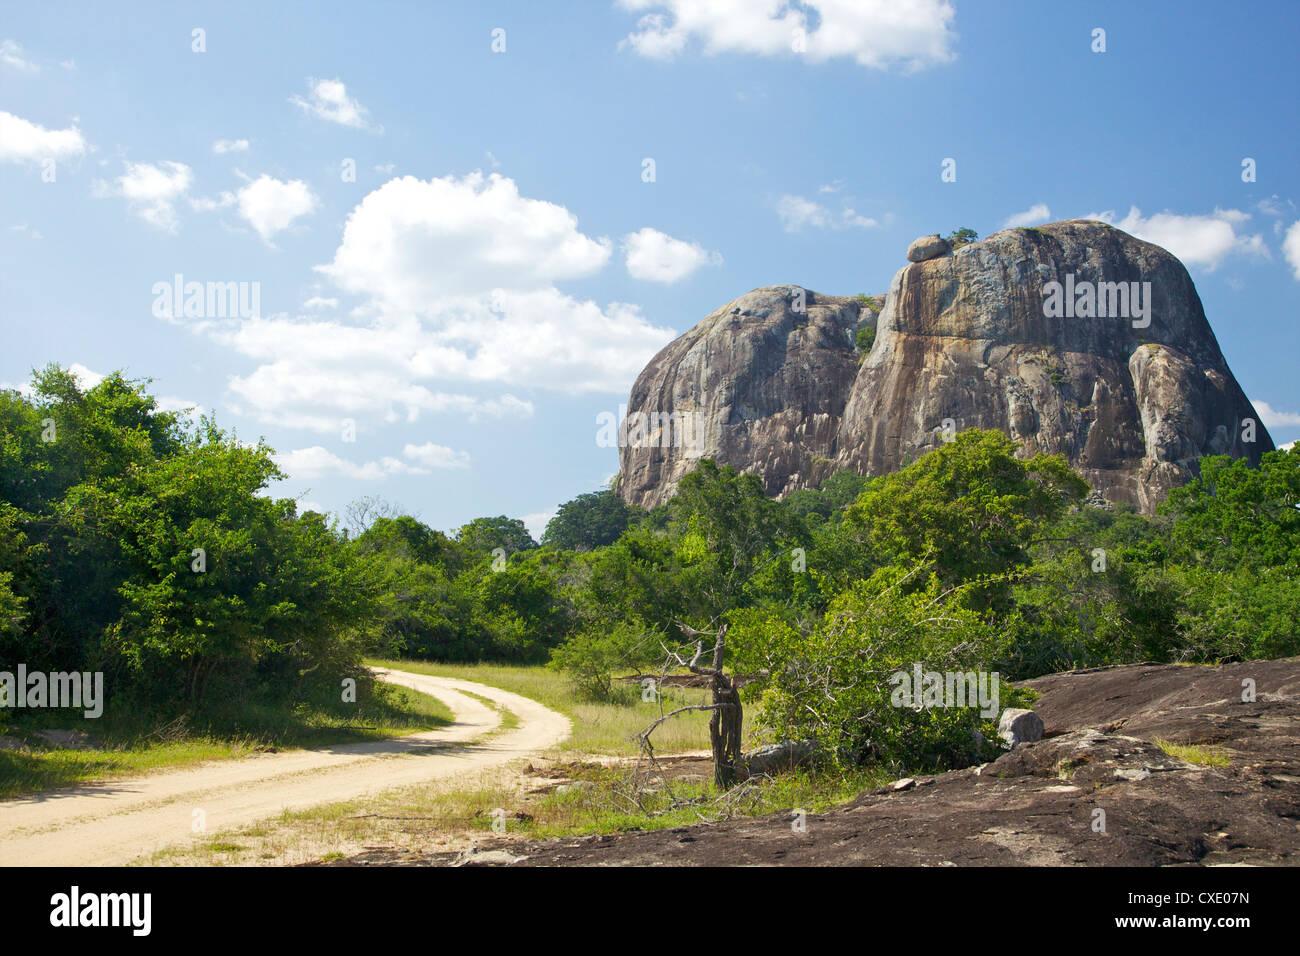 Elephant Rock aus Wald Track, Yala-Nationalpark, Sri Lanka, Asien Stockbild